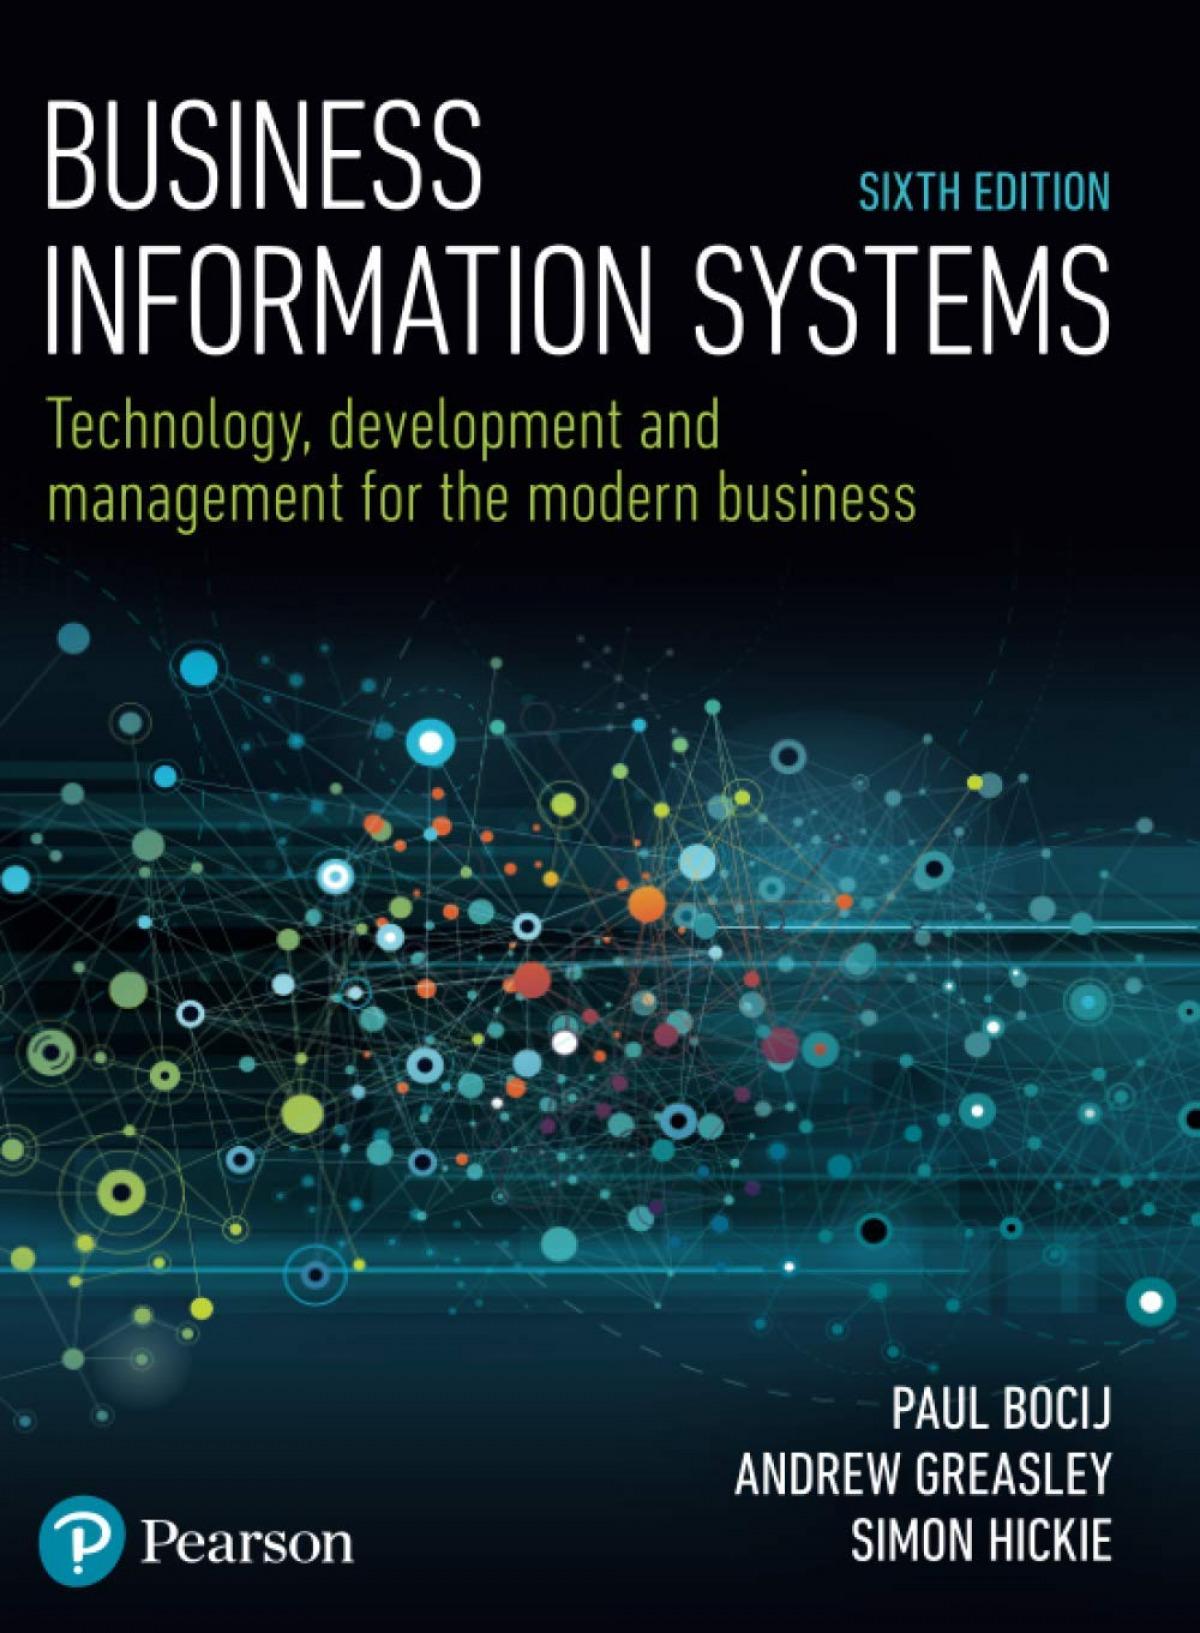 Business information systems : technology, development